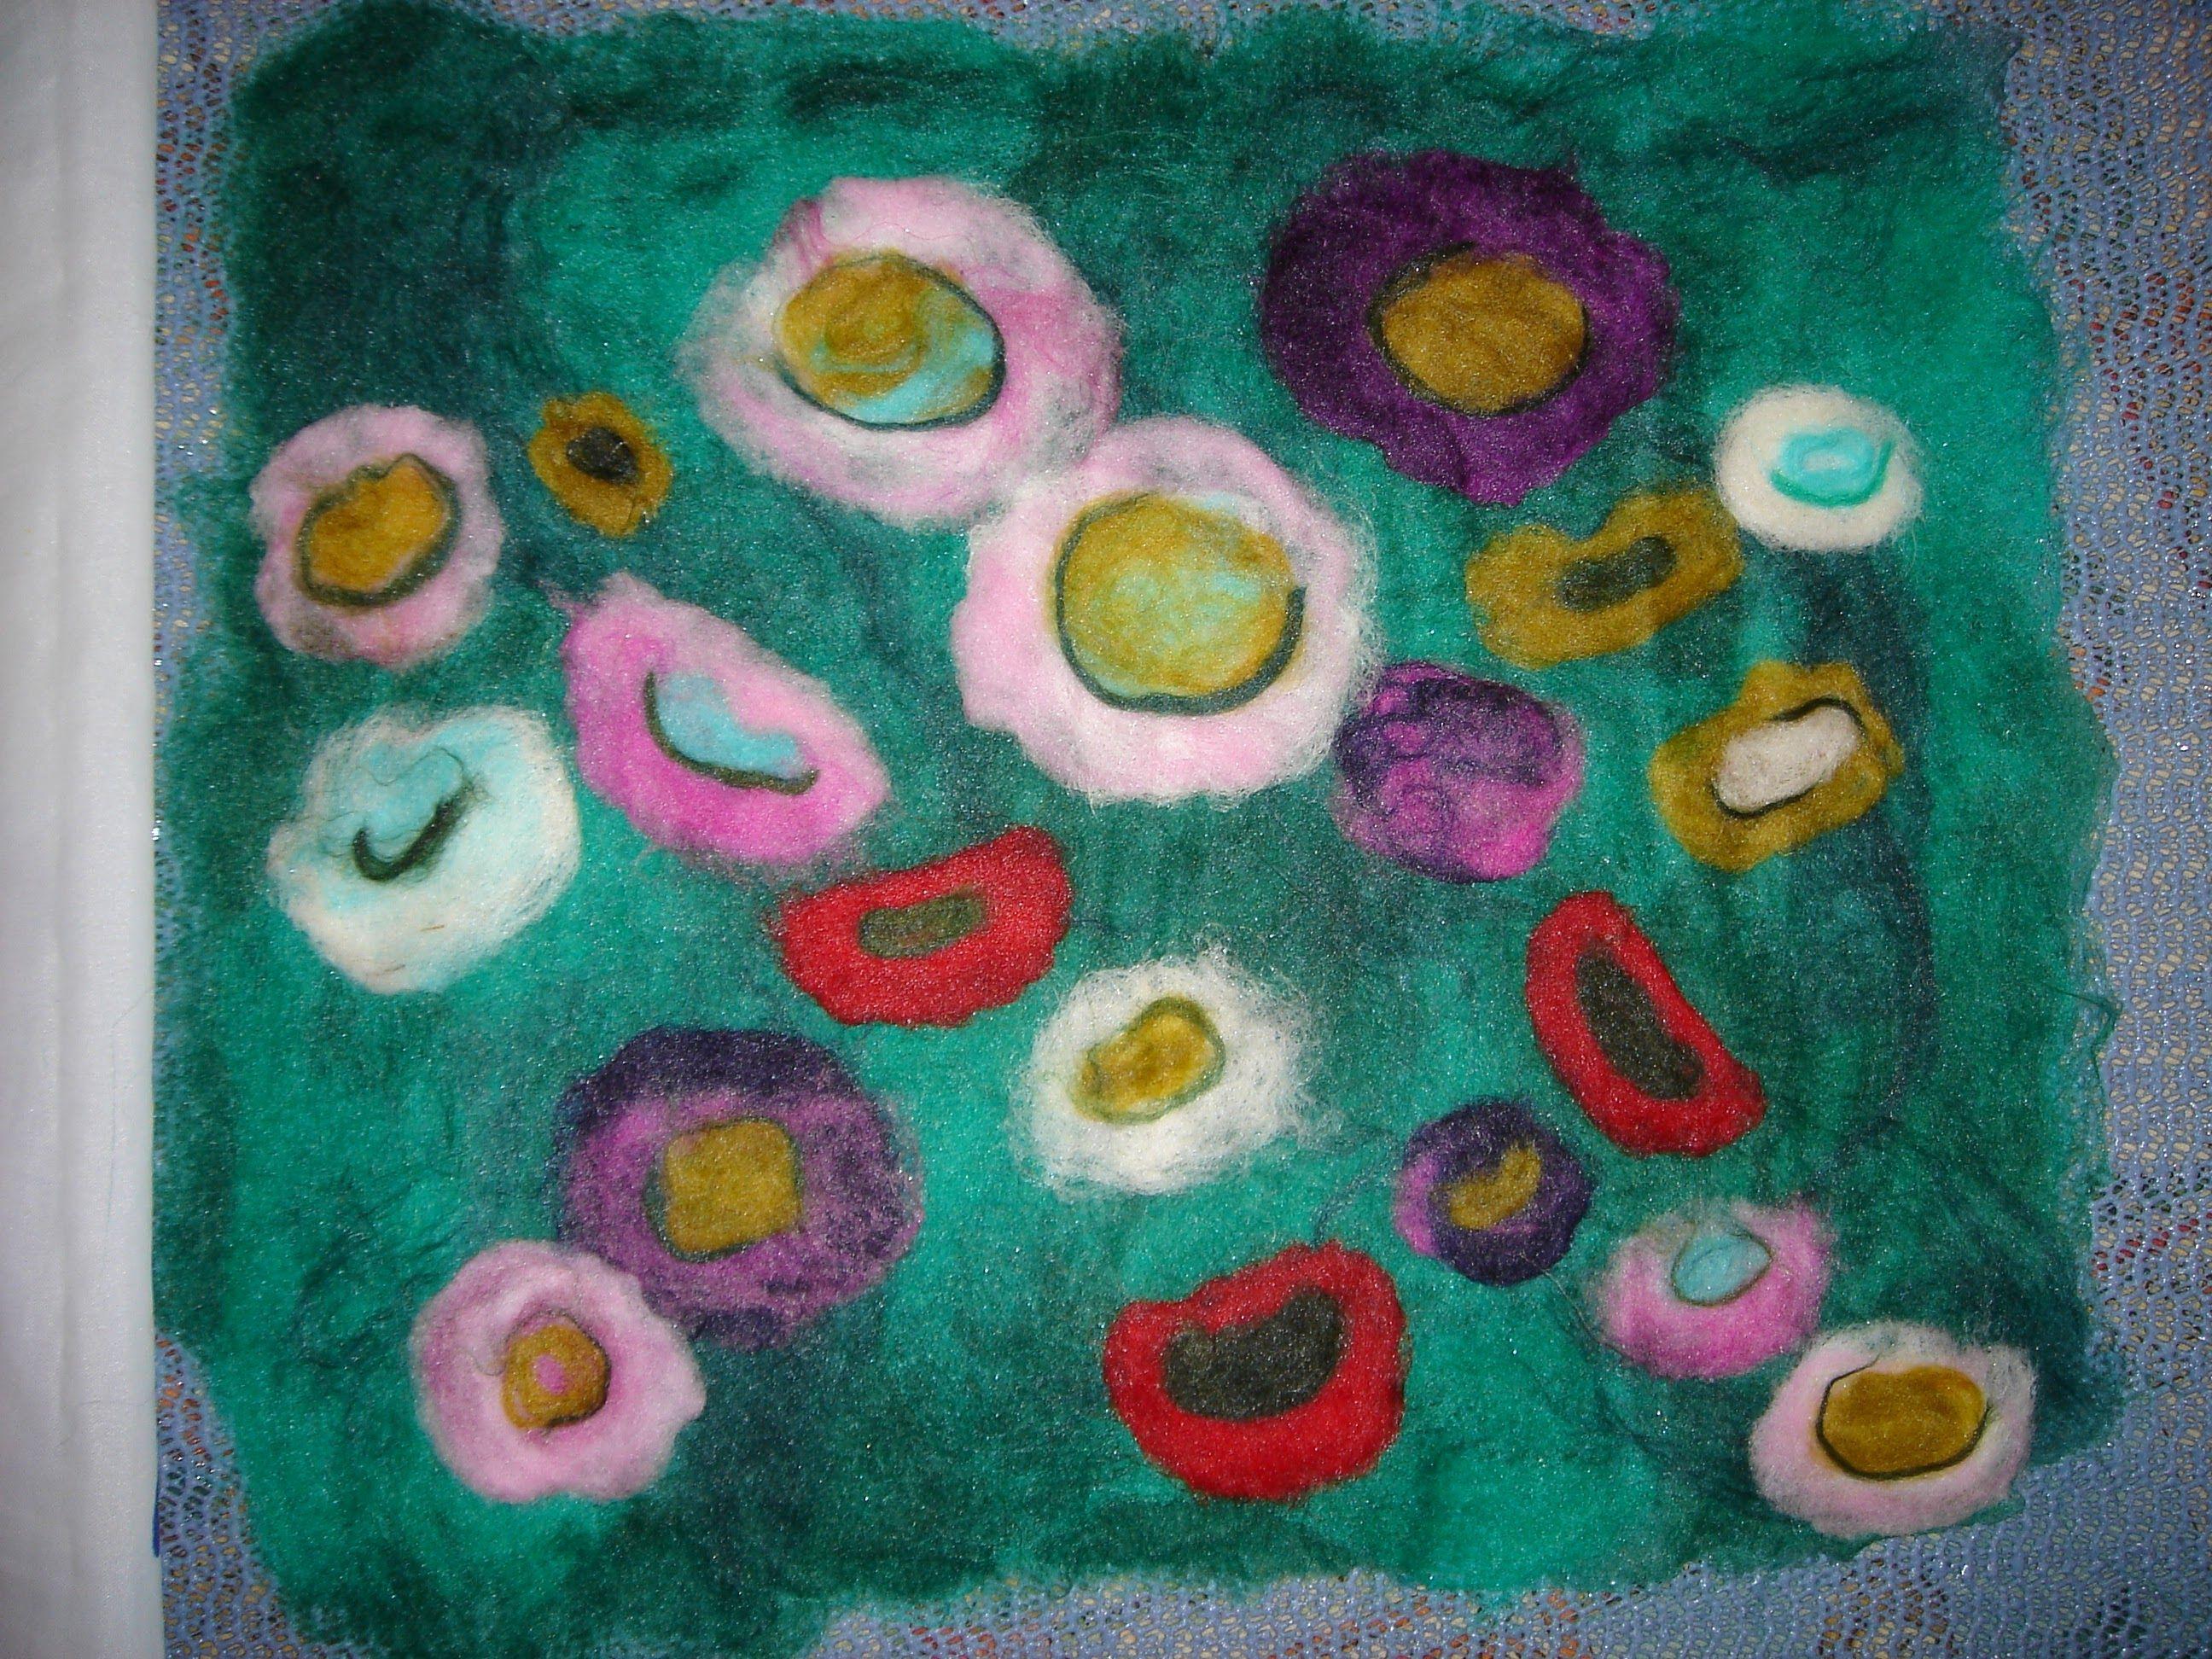 Pin by Jill Harvey on My Flower Creations Kids rugs